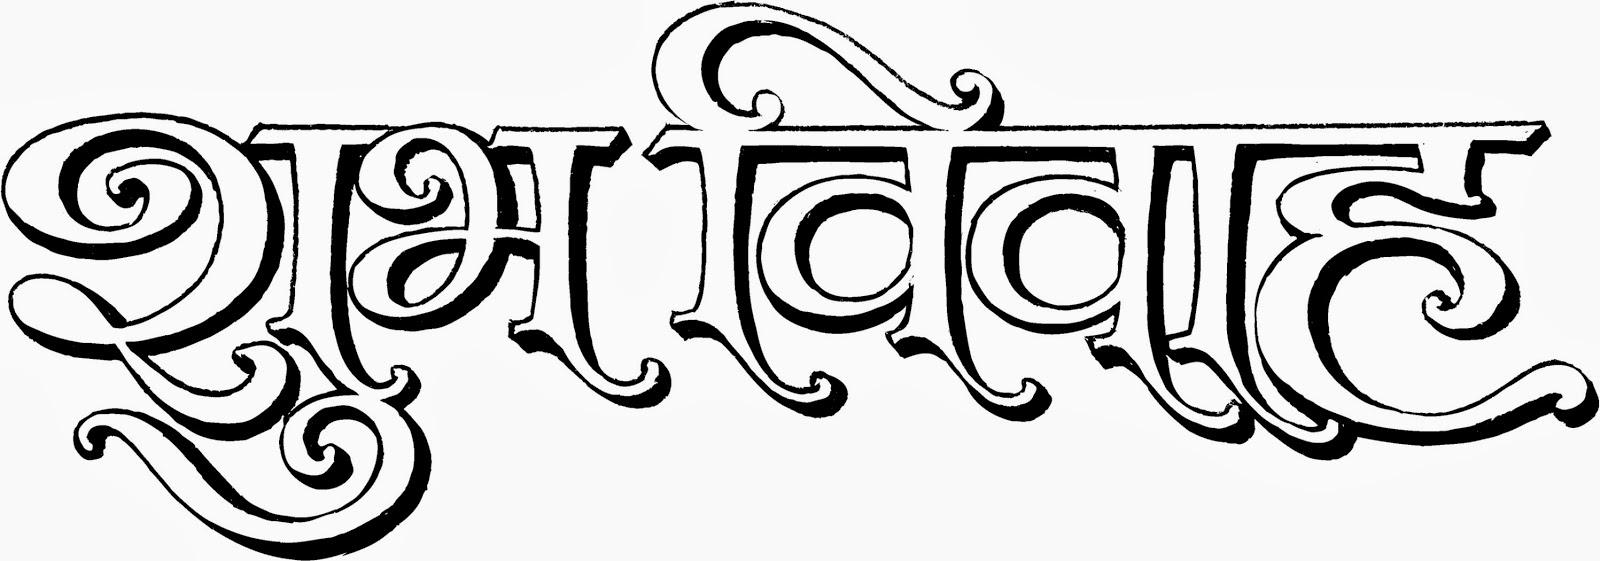 Shubh Vivah Invitation Card Marathi - Premium Invitation Template Design | Bliss Escape